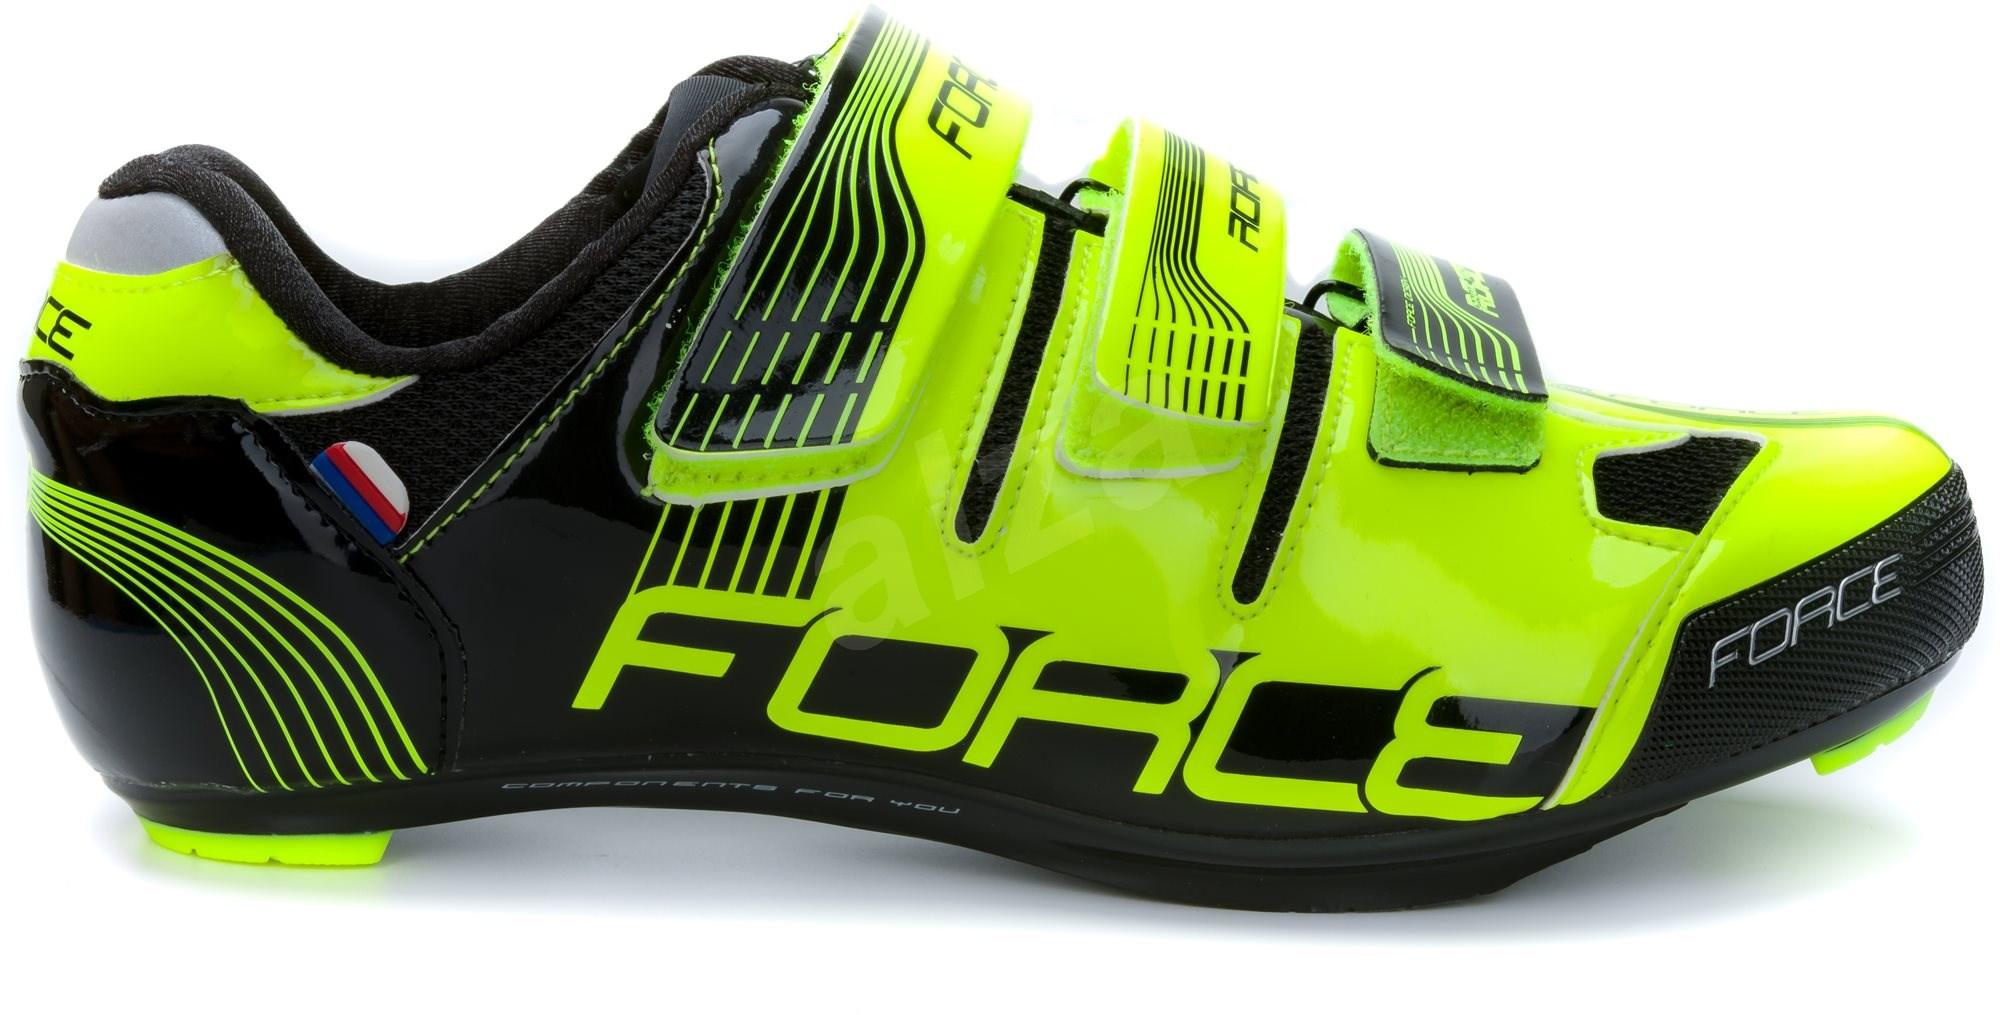 Force Road - fluo/fekete  mérete 40/252 mm - Kerékpáros cipő.